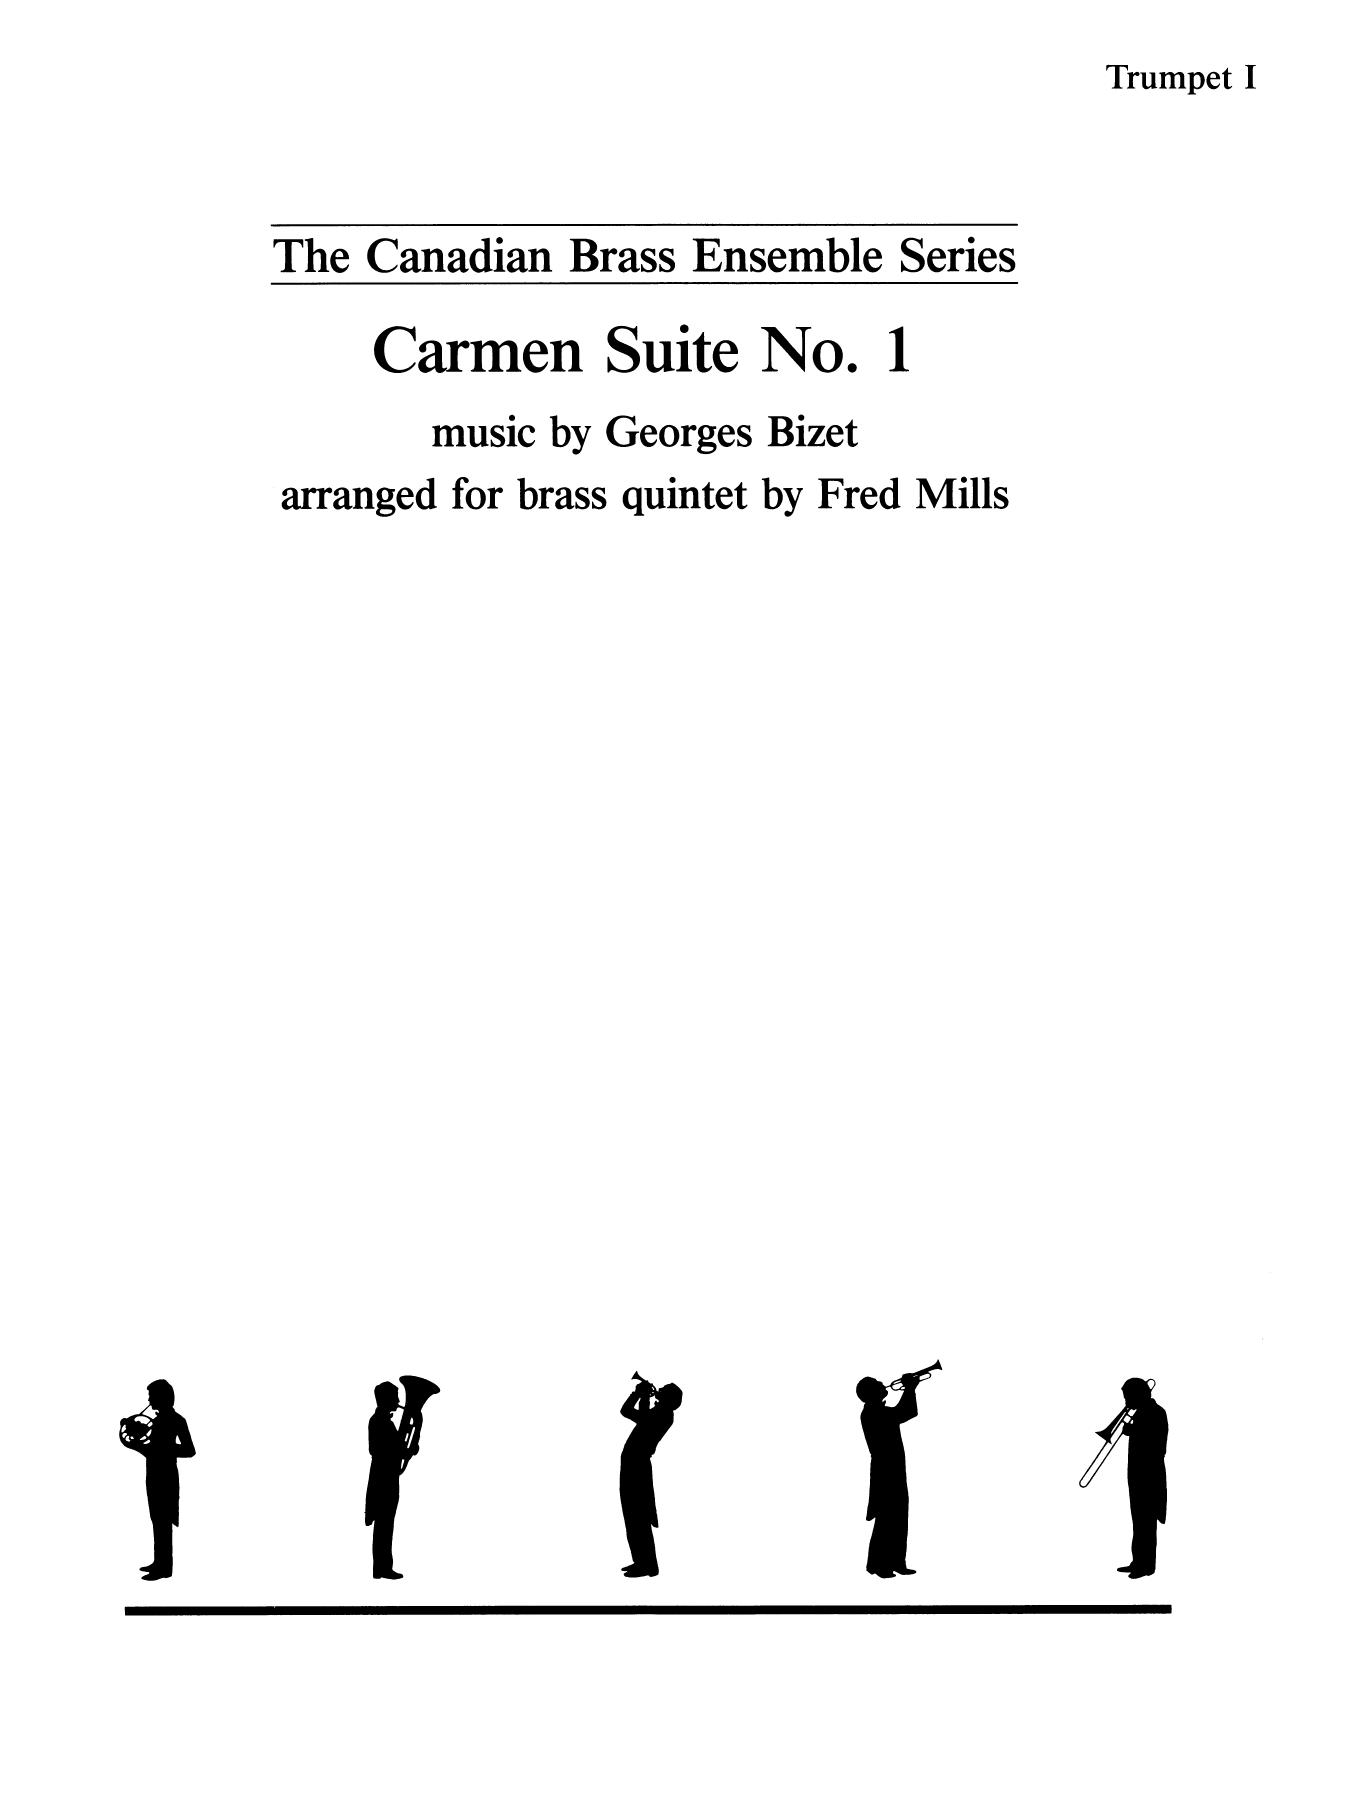 Carmen Suite No. 1 - Bb Trumpet 1 (Brass Quintet) Sheet Music